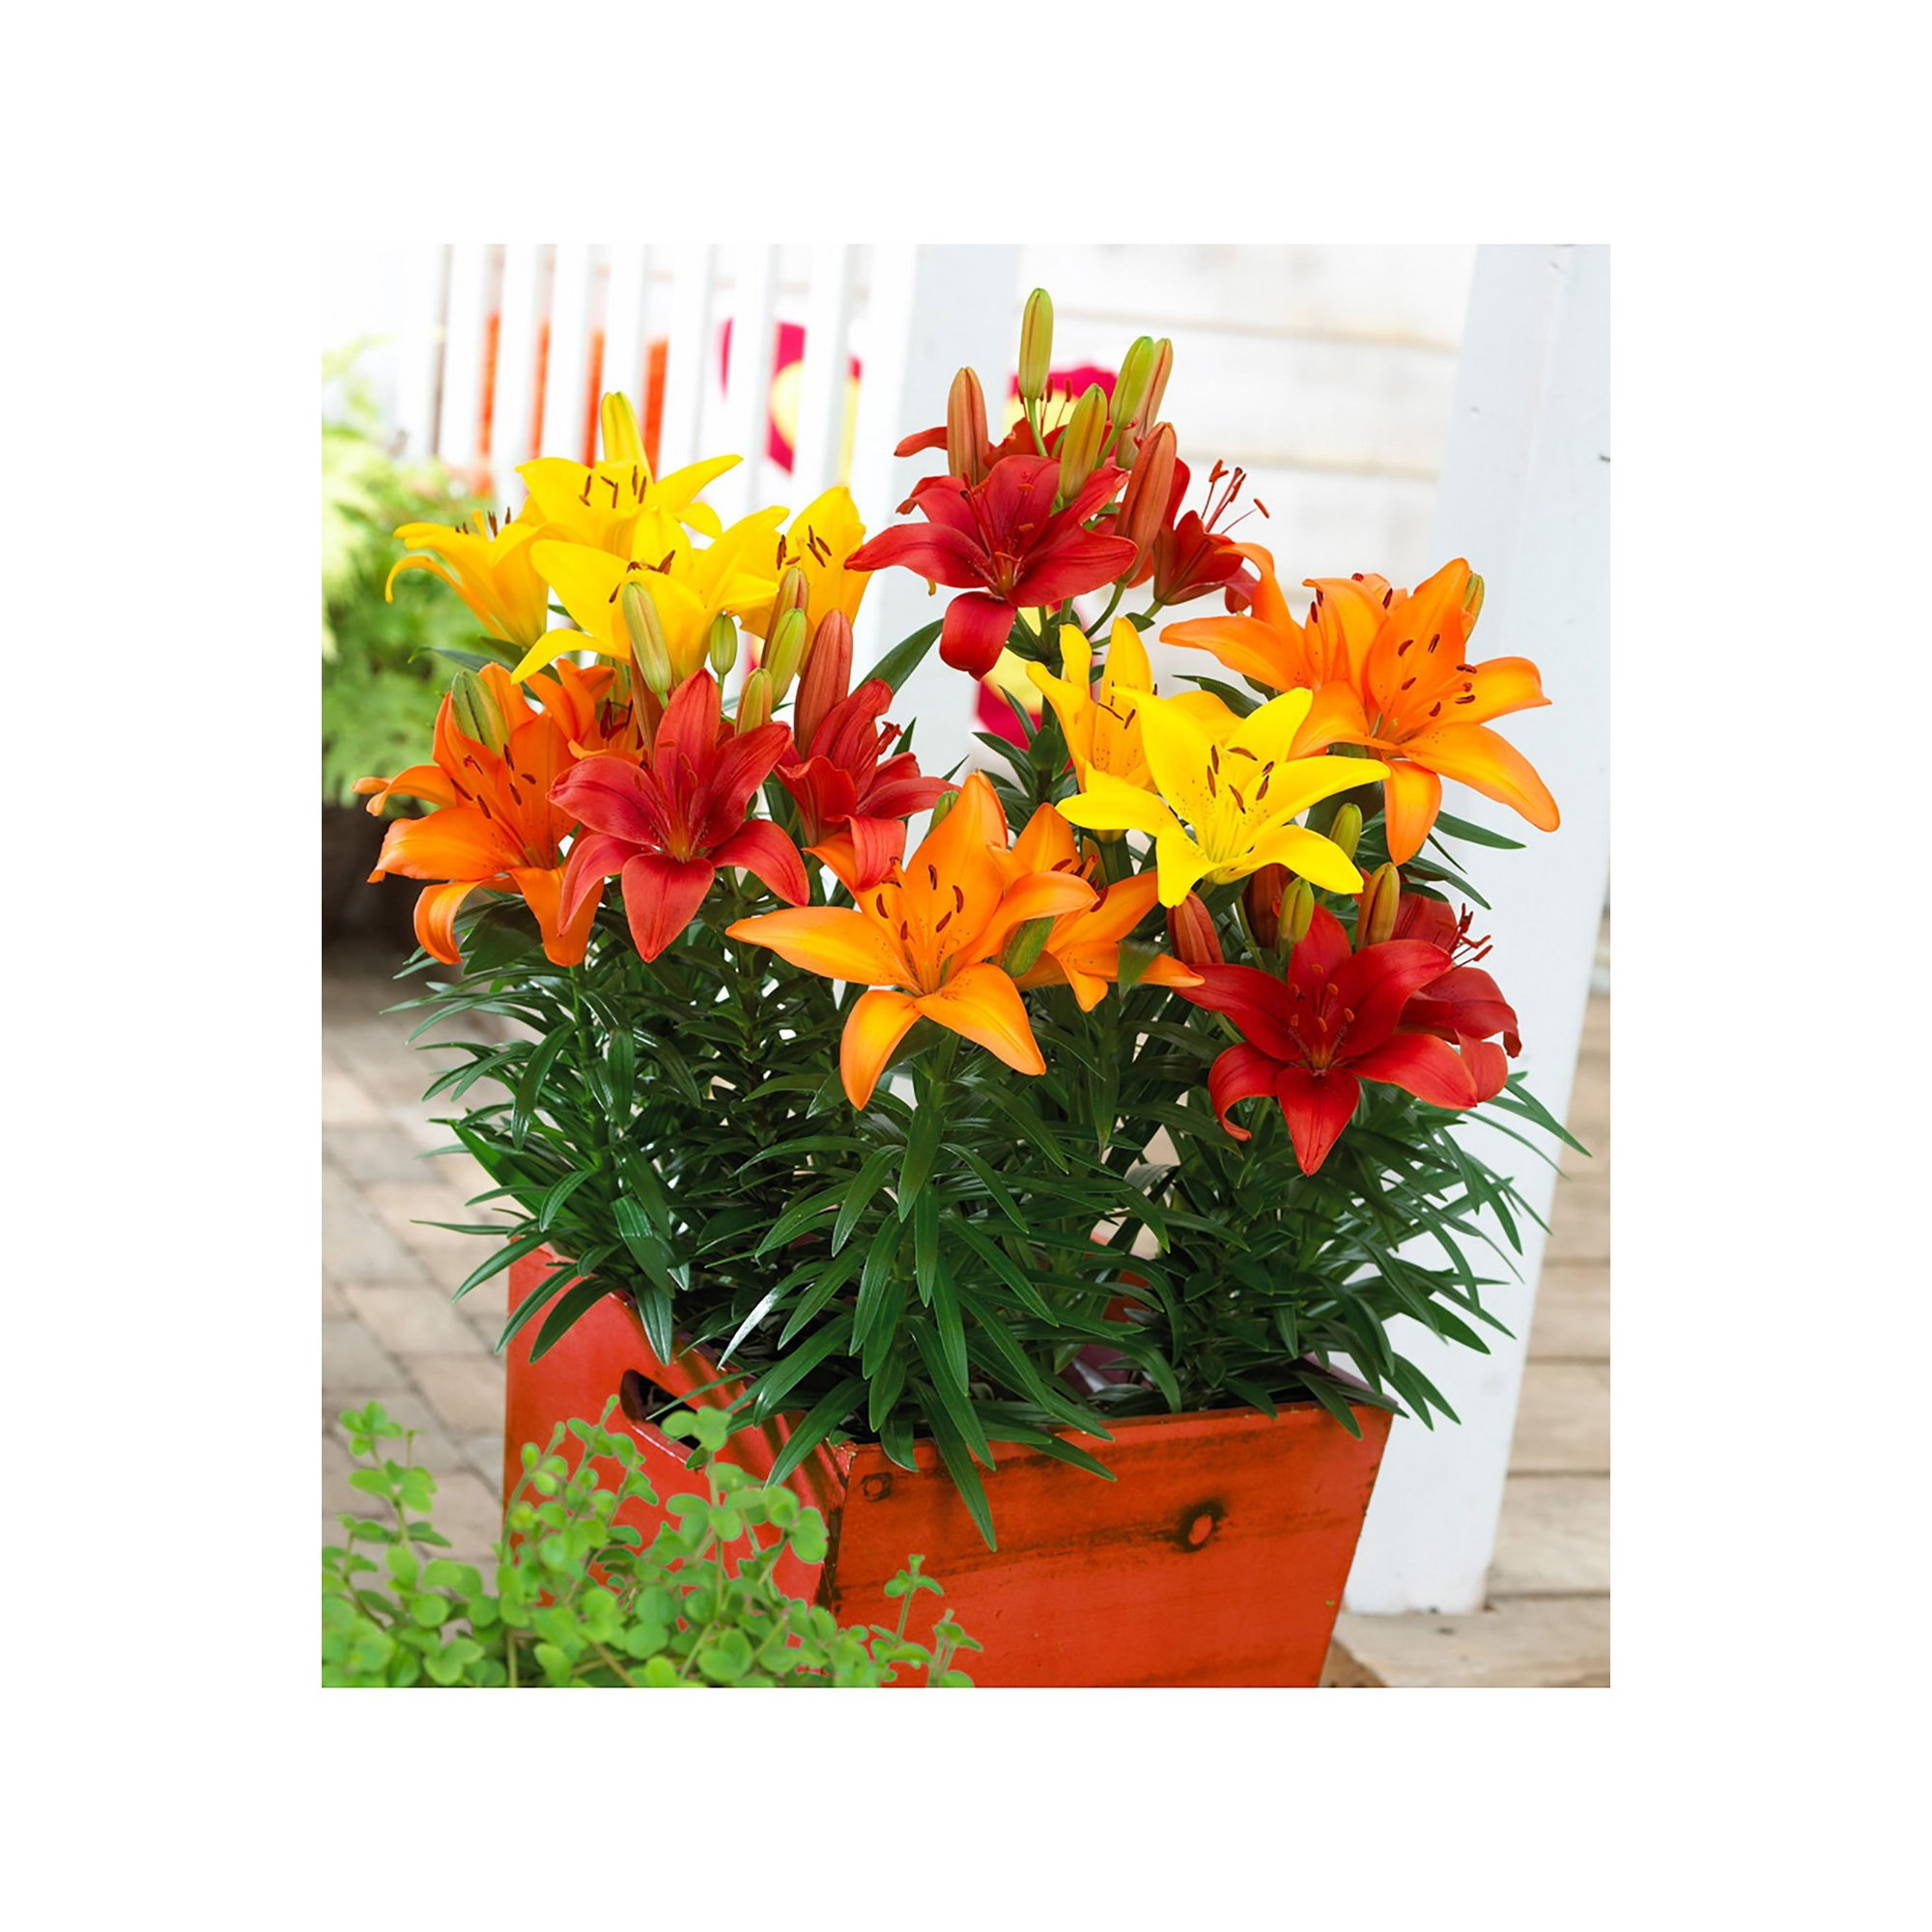 Image of 25 Longiflorum Asiatic LA Lily Bulbs